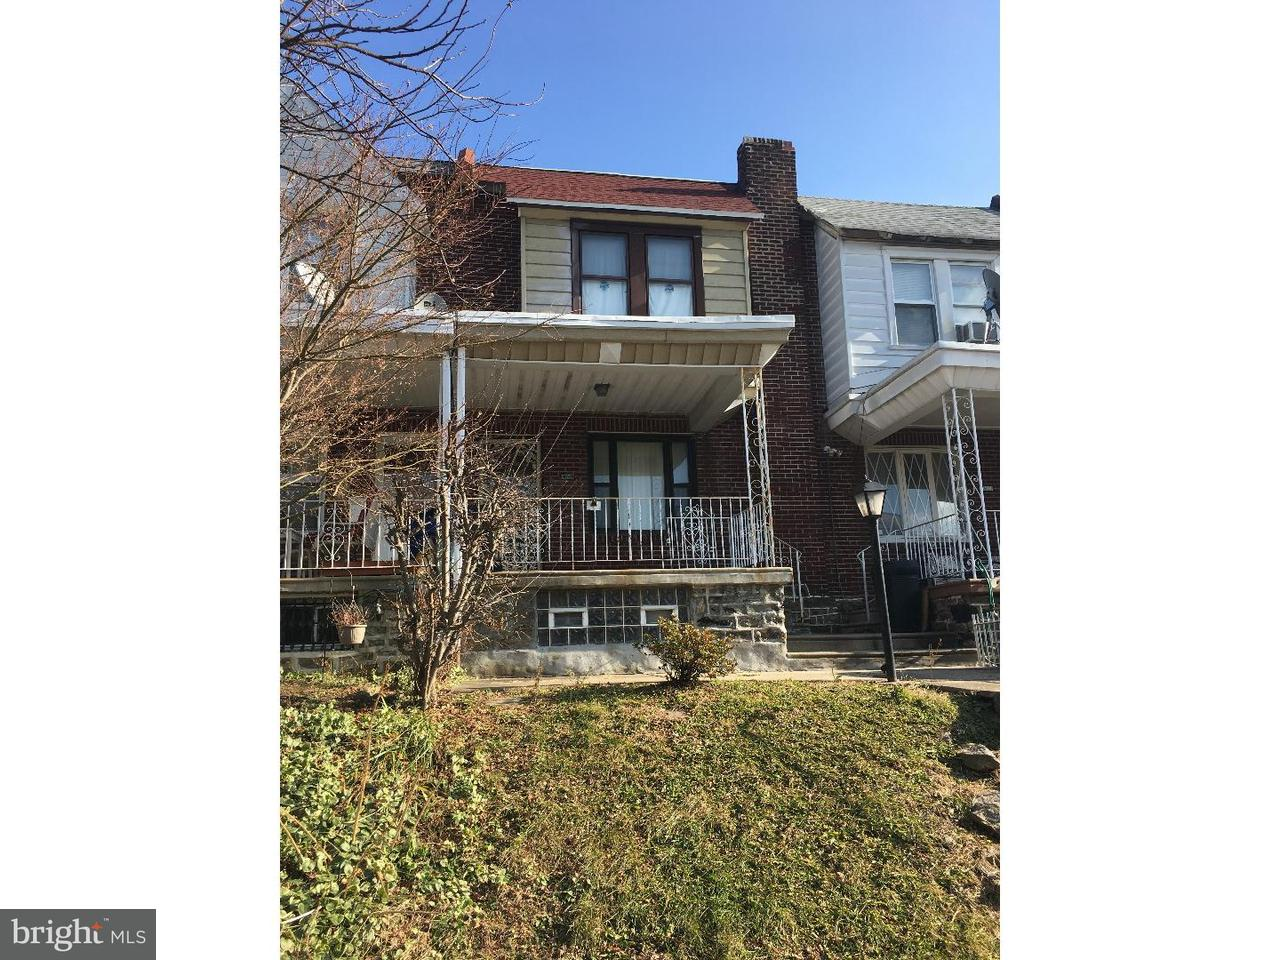 6721 N Bouvier Philadelphia, PA 19126